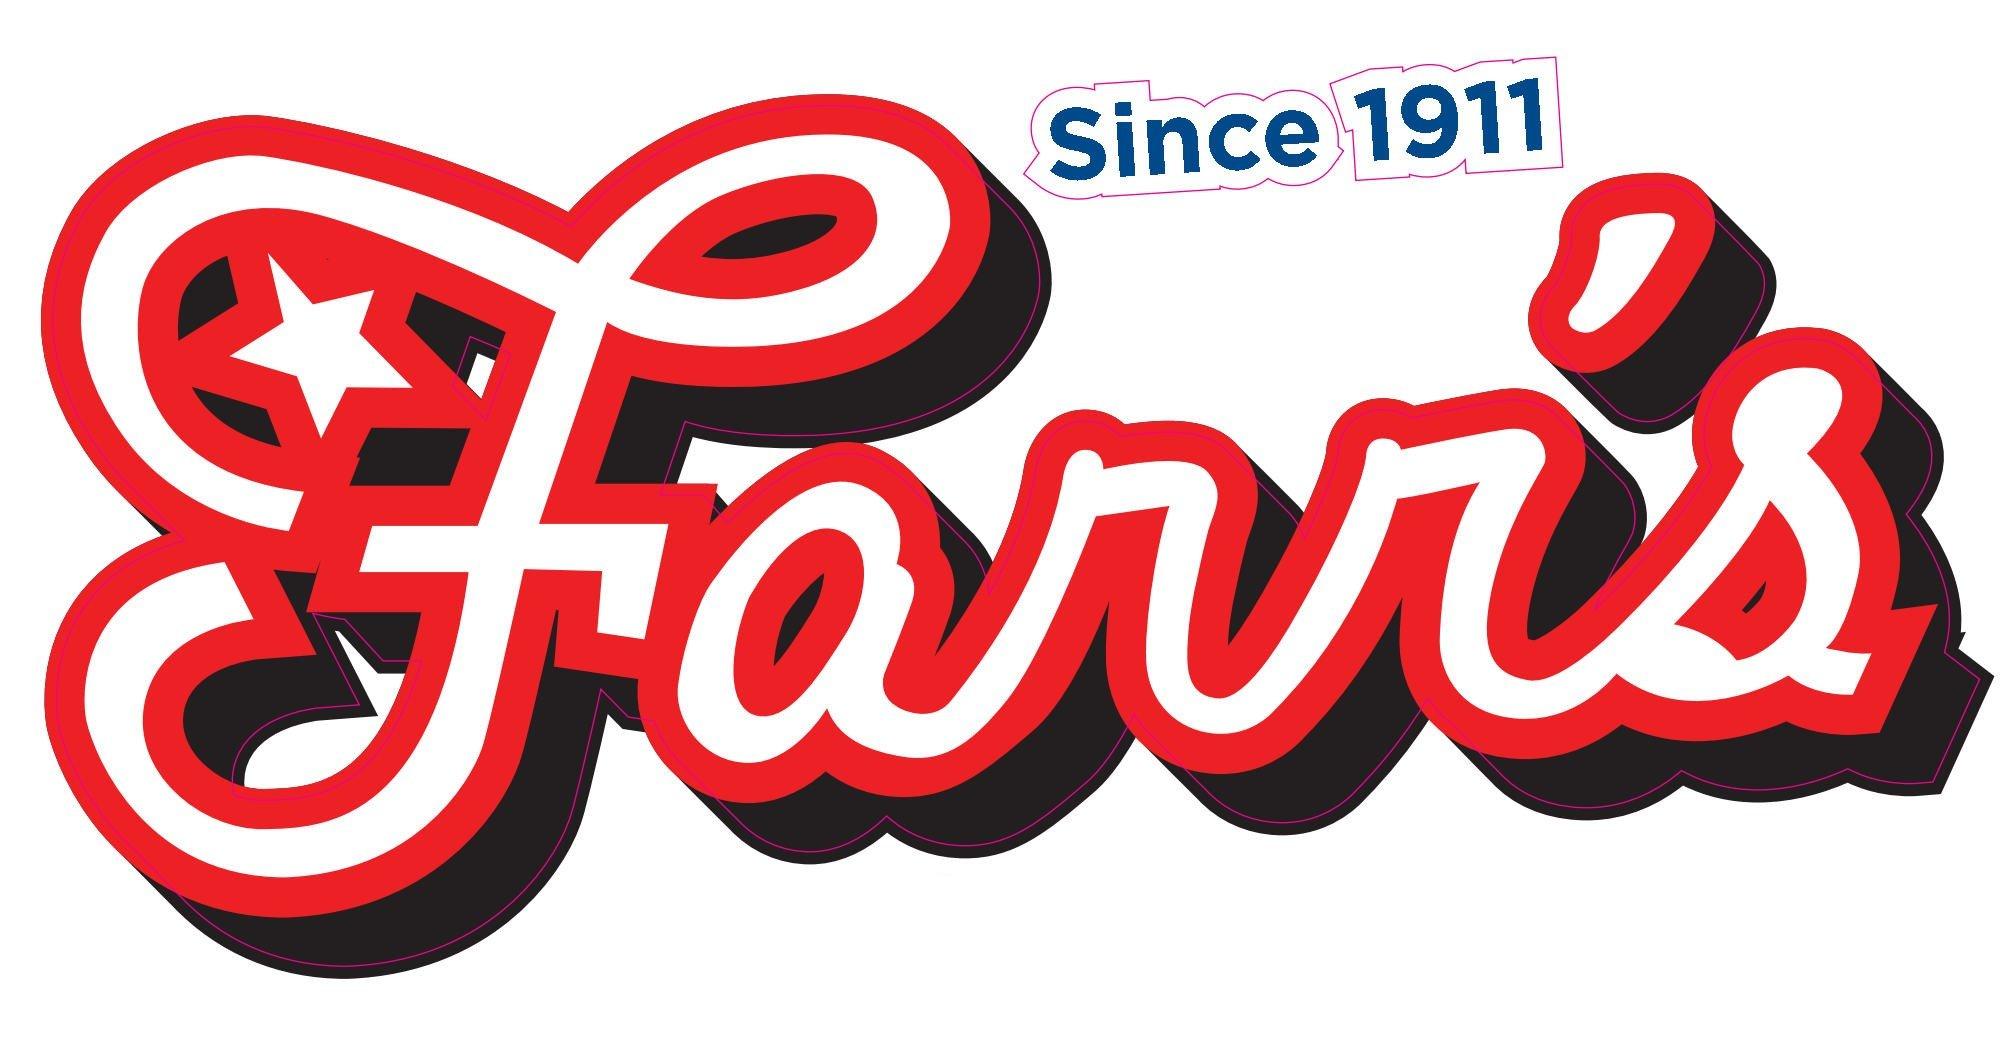 Farr Candy Company Inc.